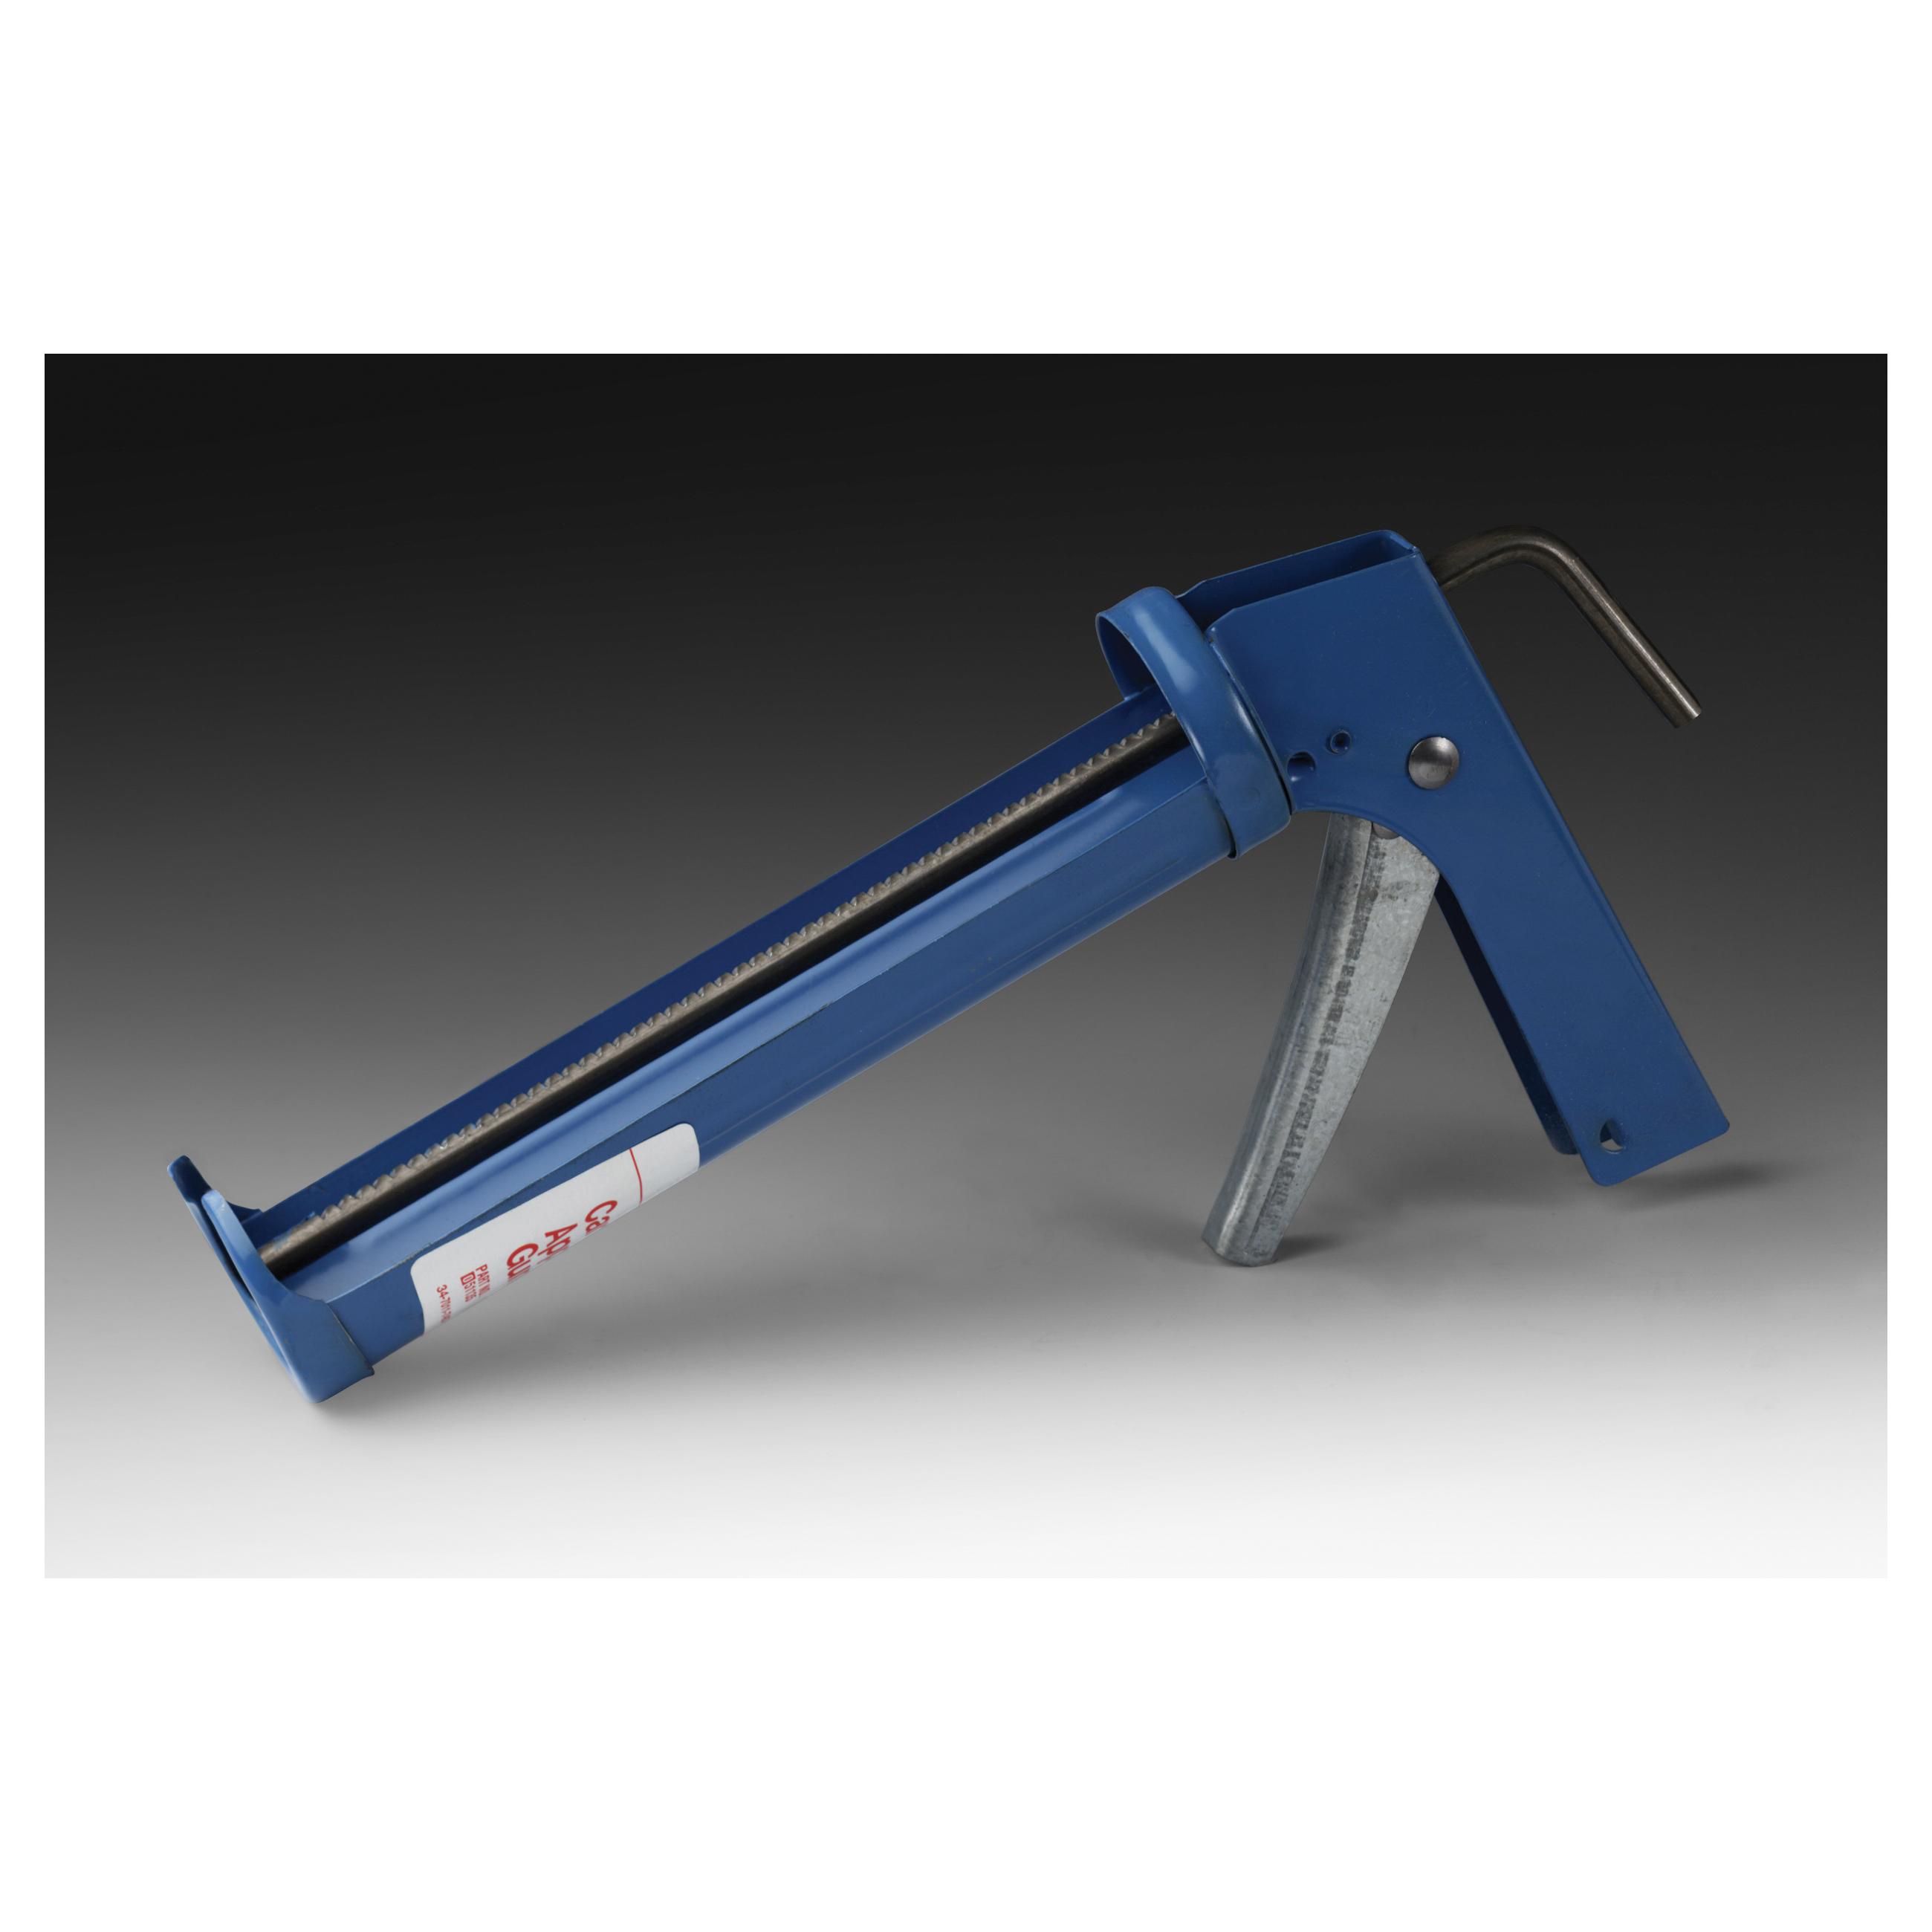 3M™ 051135-08992 Manual Cartridge Applicator Gun, 0.1 gal, Blue